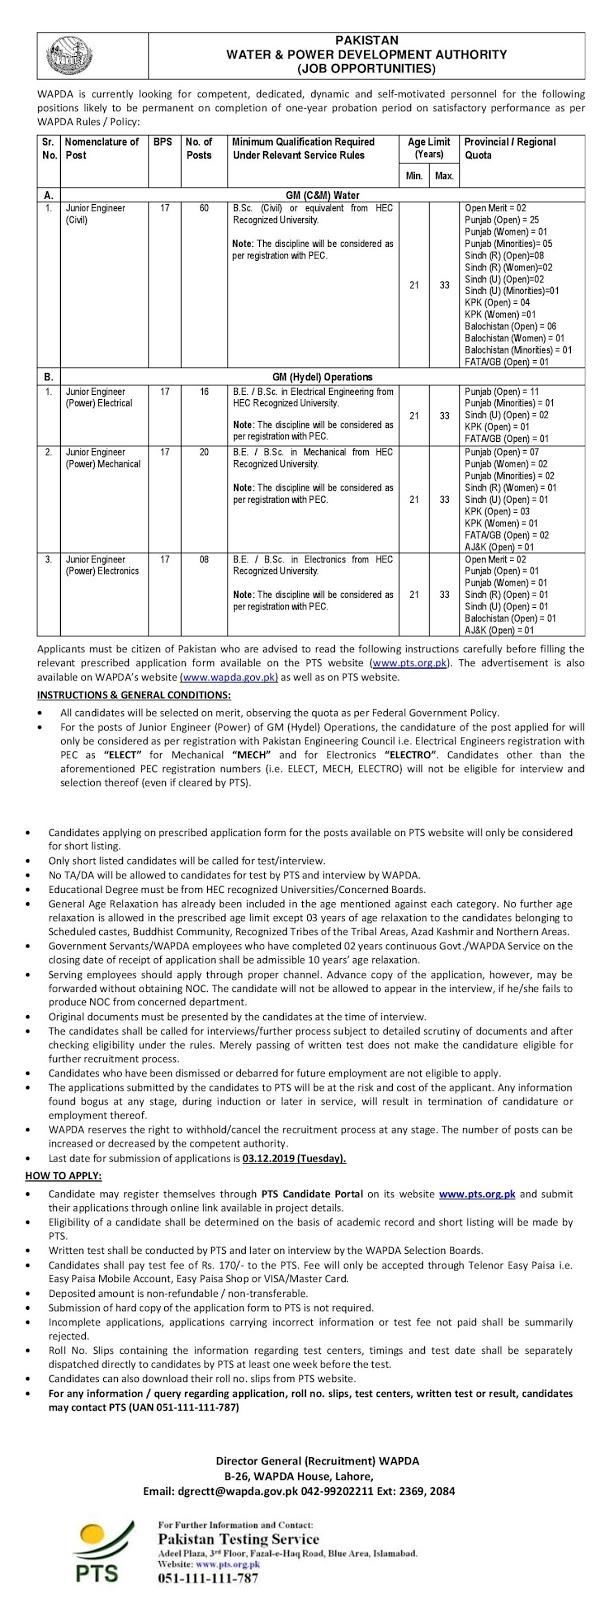 Jobs in Wapda, Wapda latest Jobs 2019 , Wapda 100+ Latest Jobs 2019 December